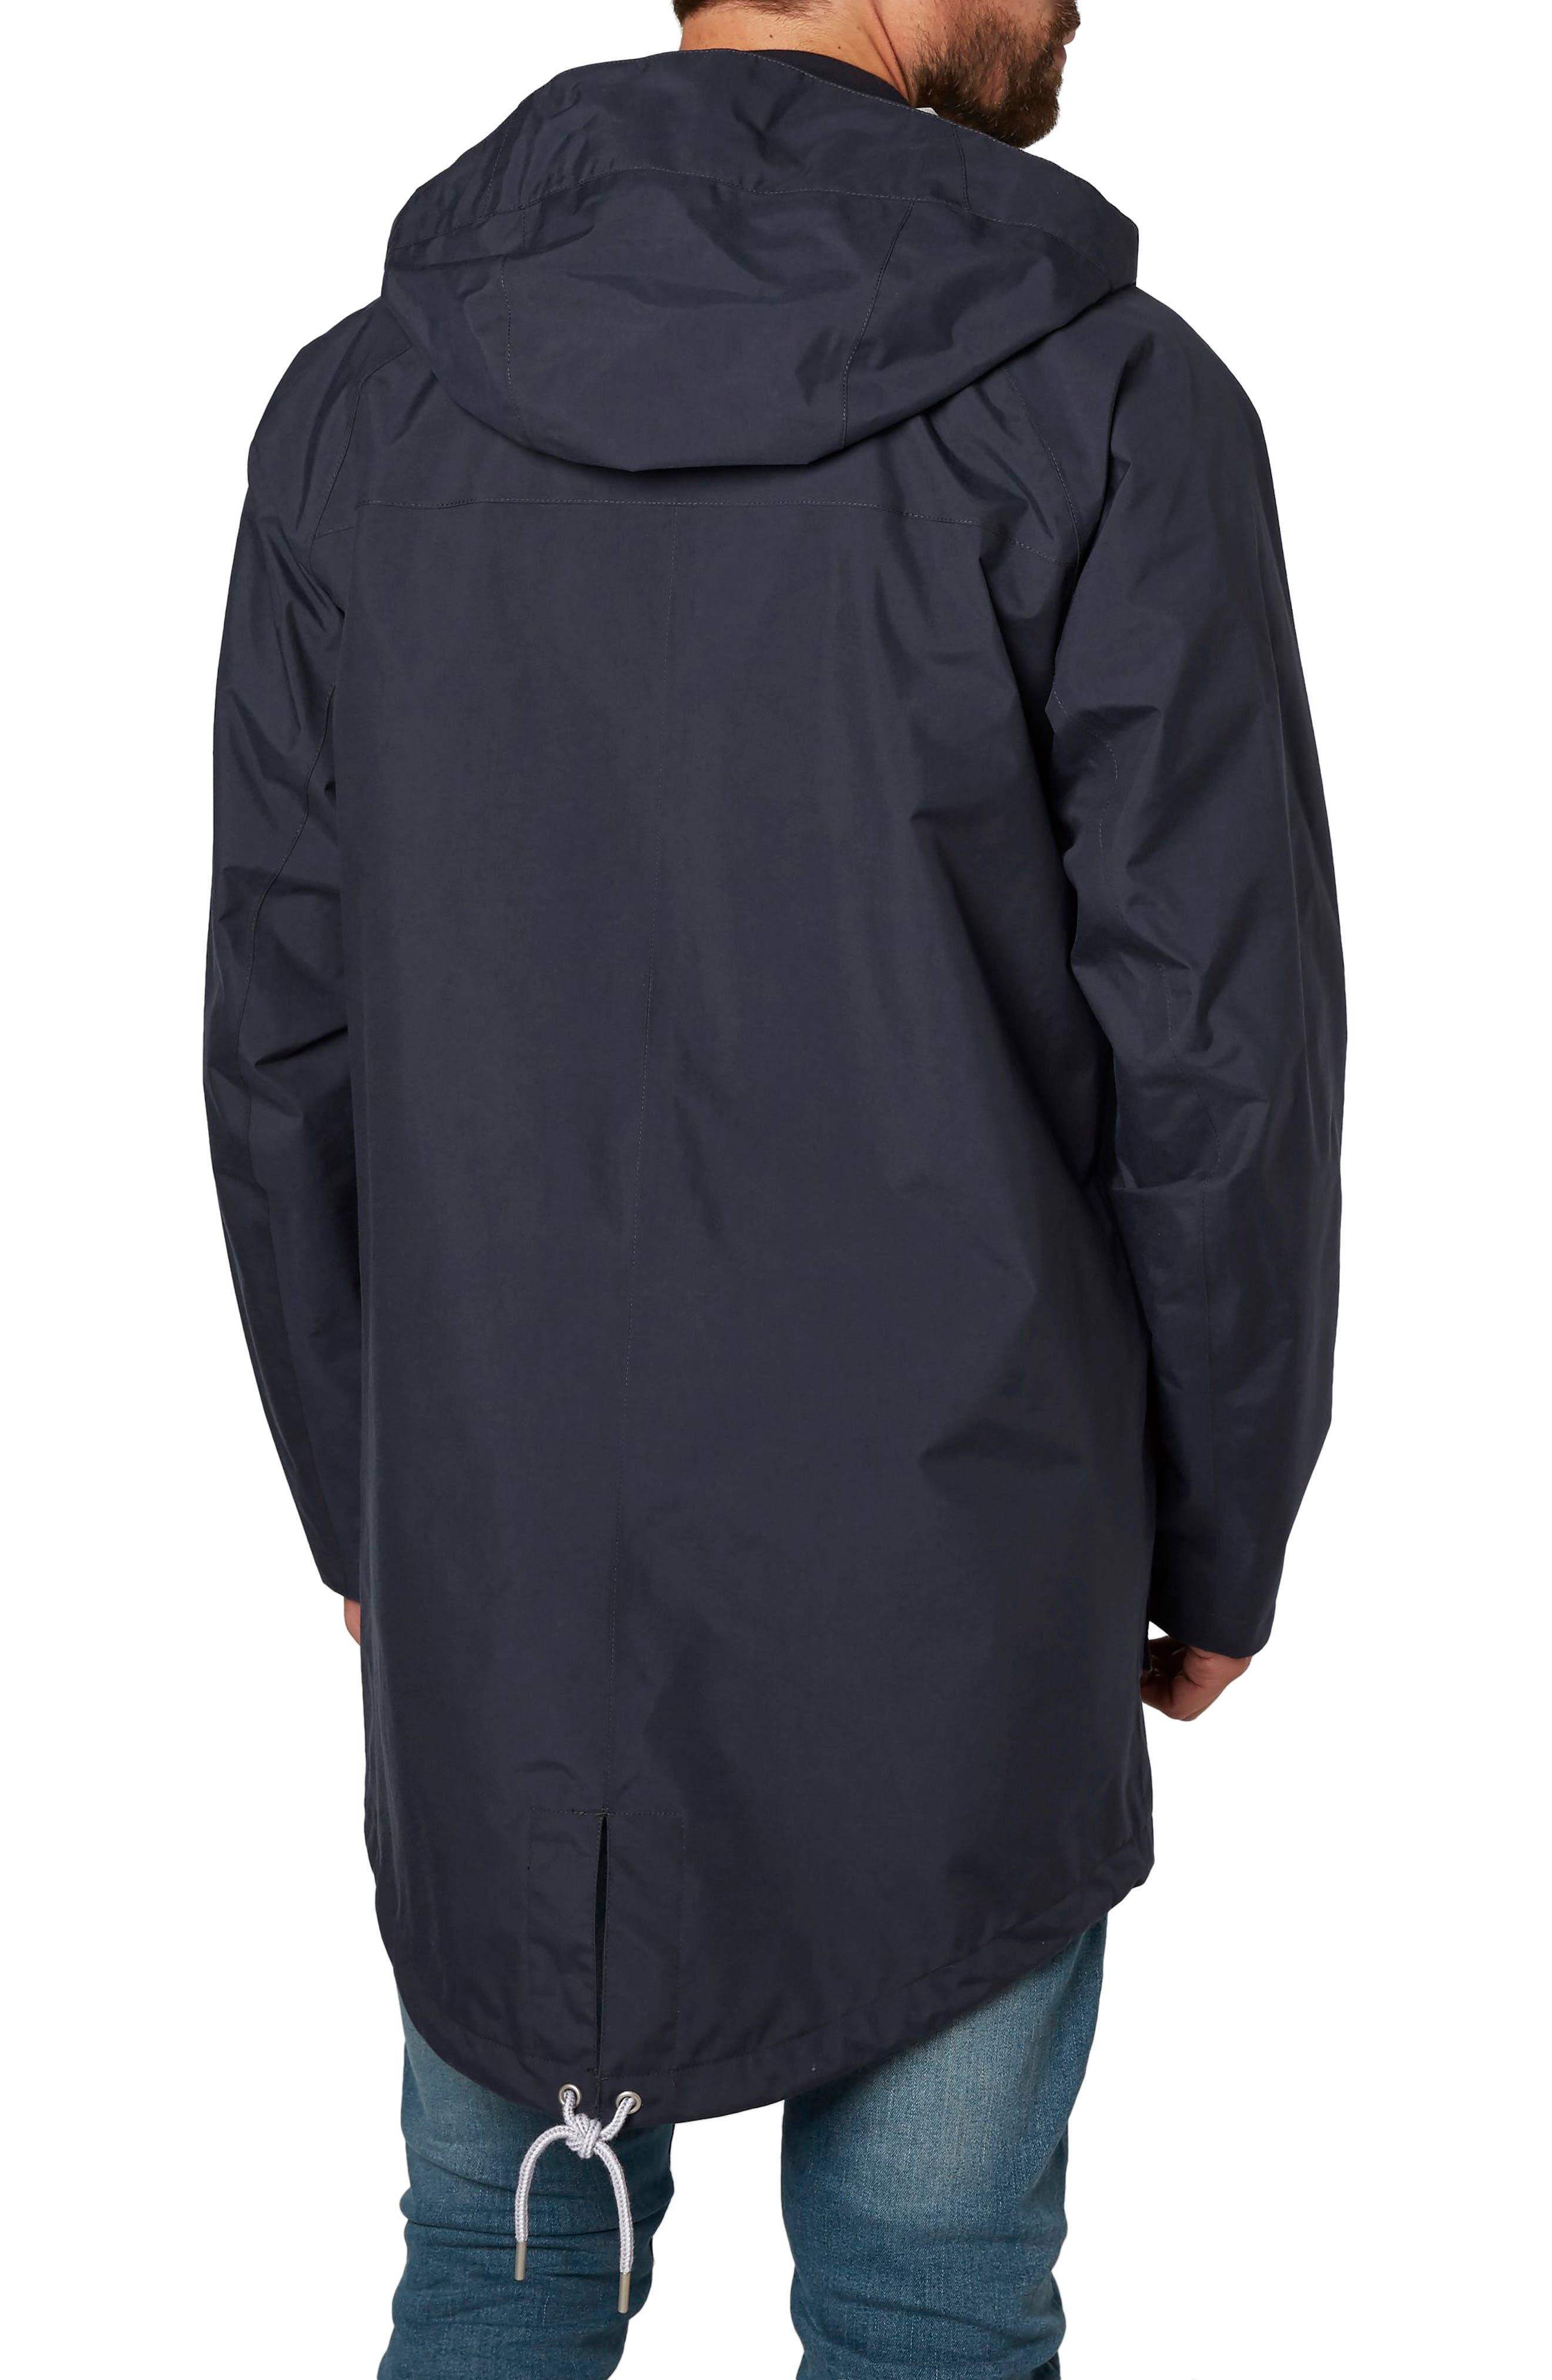 Elements Hooded Rain Jacket,                             Alternate thumbnail 2, color,                             494